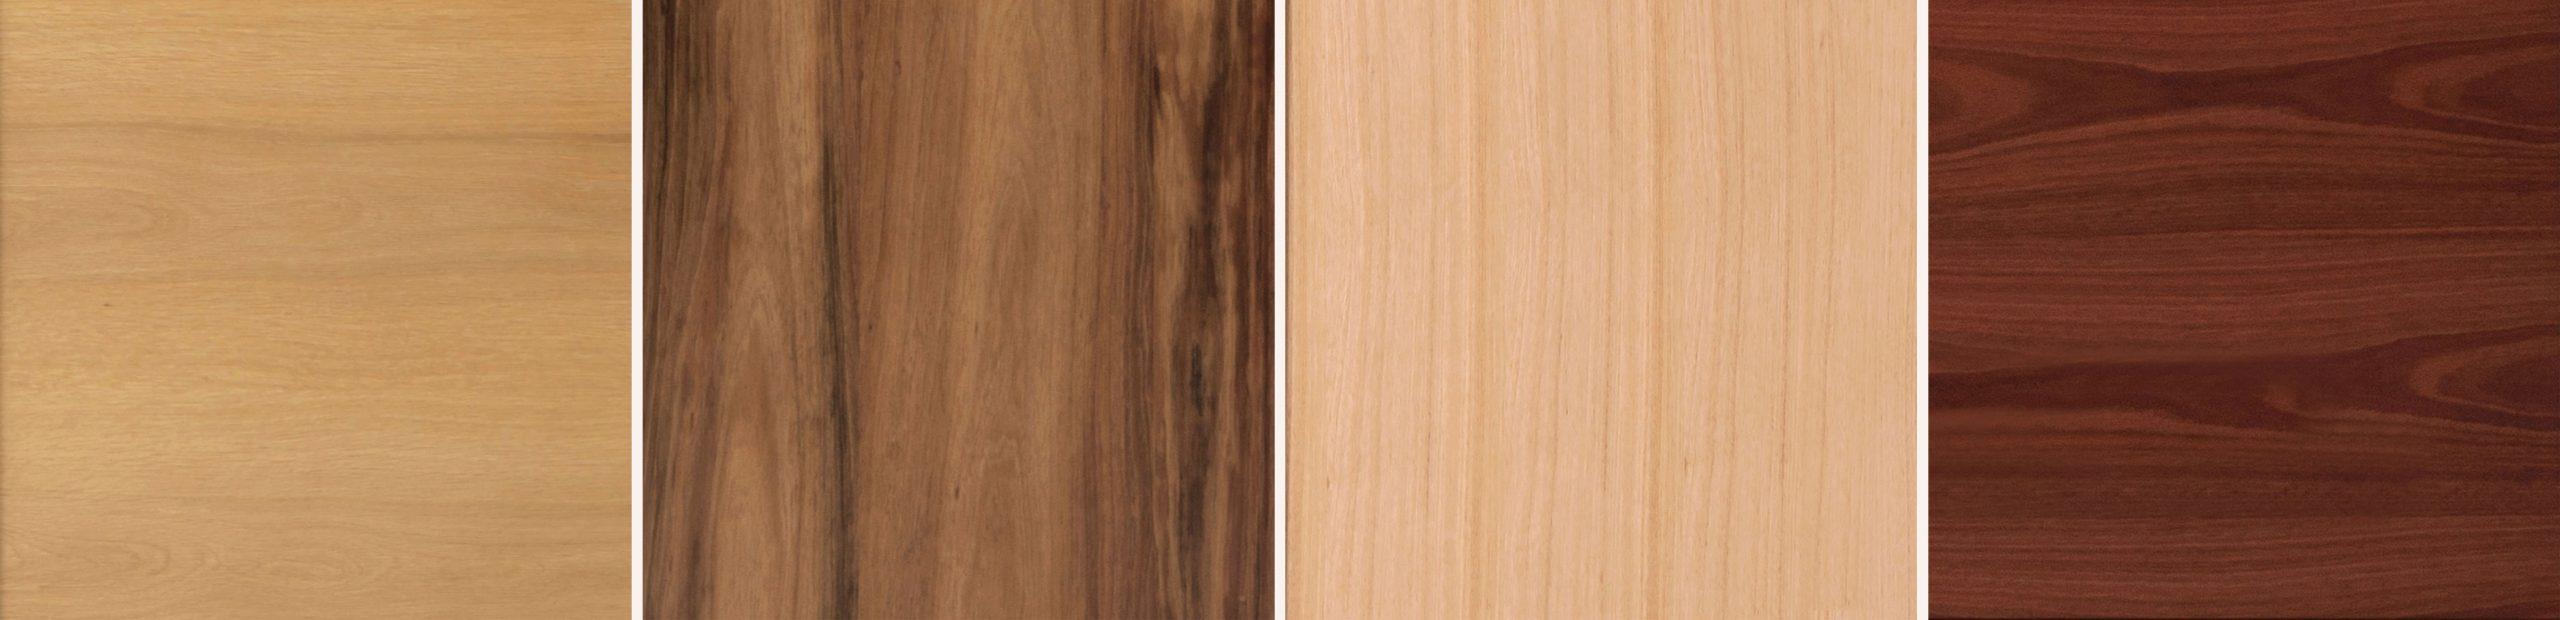 quality hardwood timber selections